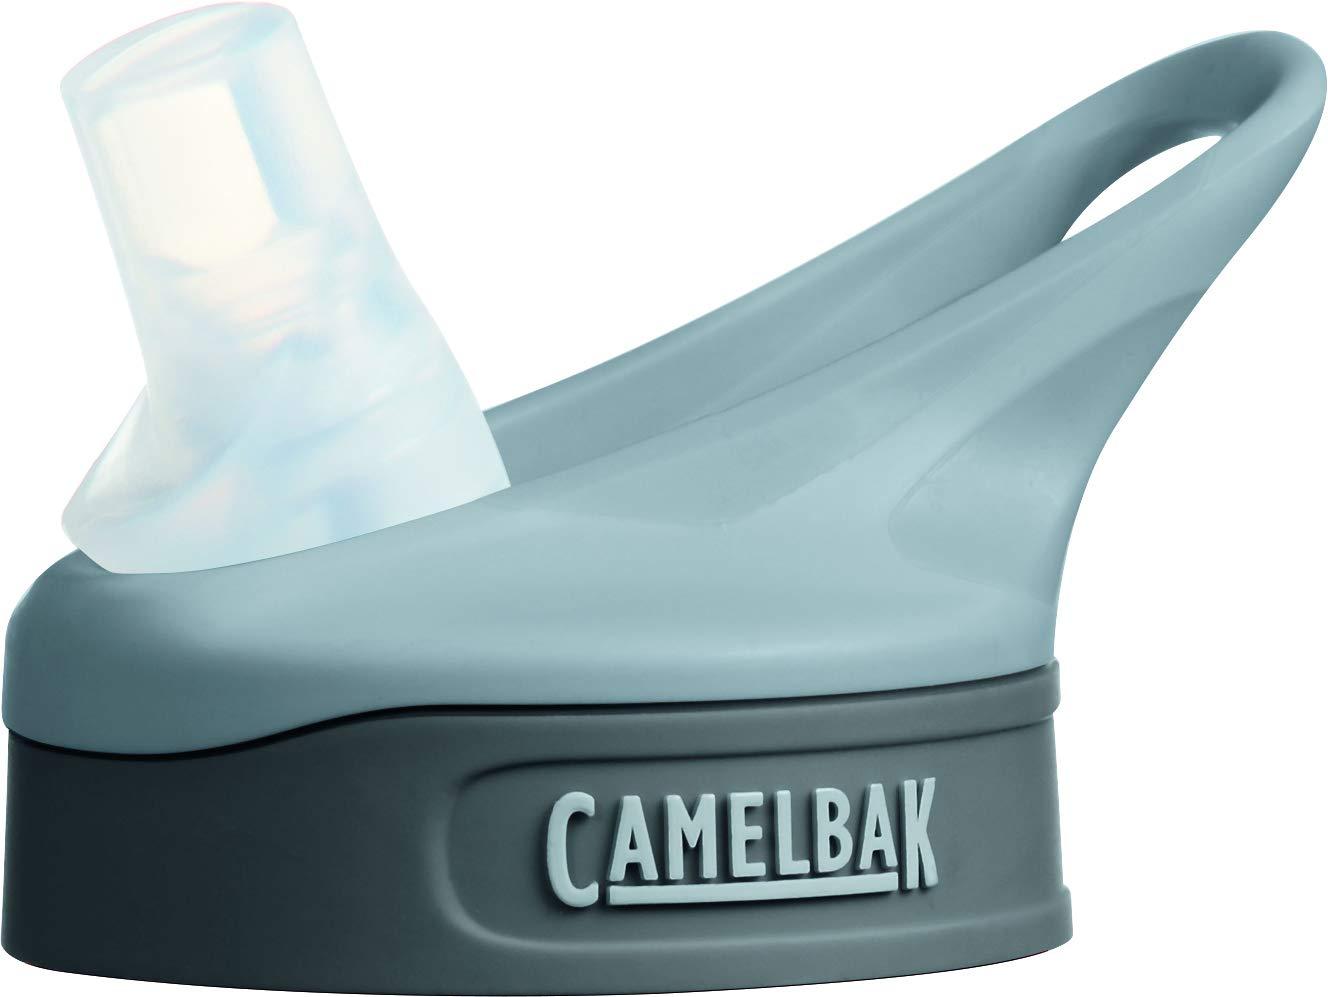 Camelbak Eddy Bottle (1-Liter/33-Ounce,Charcoal) by CamelBak (Image #5)